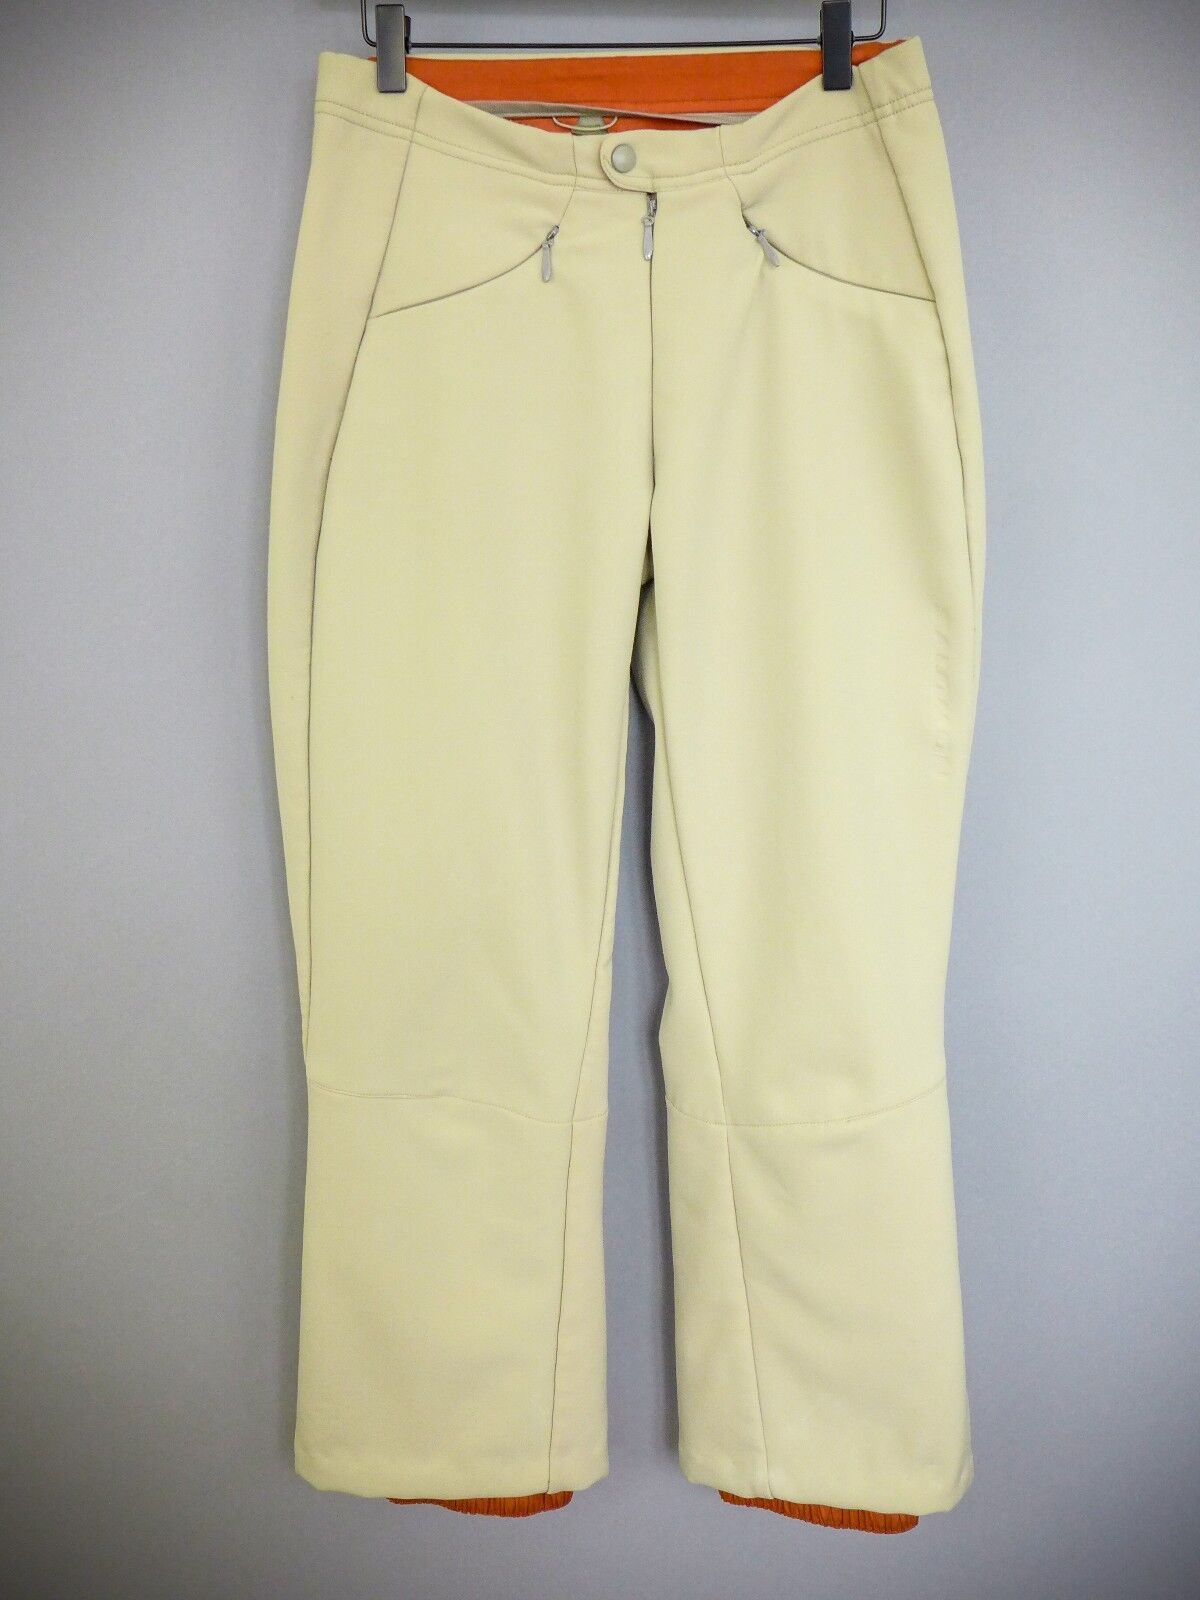 XII348  Softshell Salomon Advanced Skin Skiing Snowboardint Trousers M W29 L29  limit buy